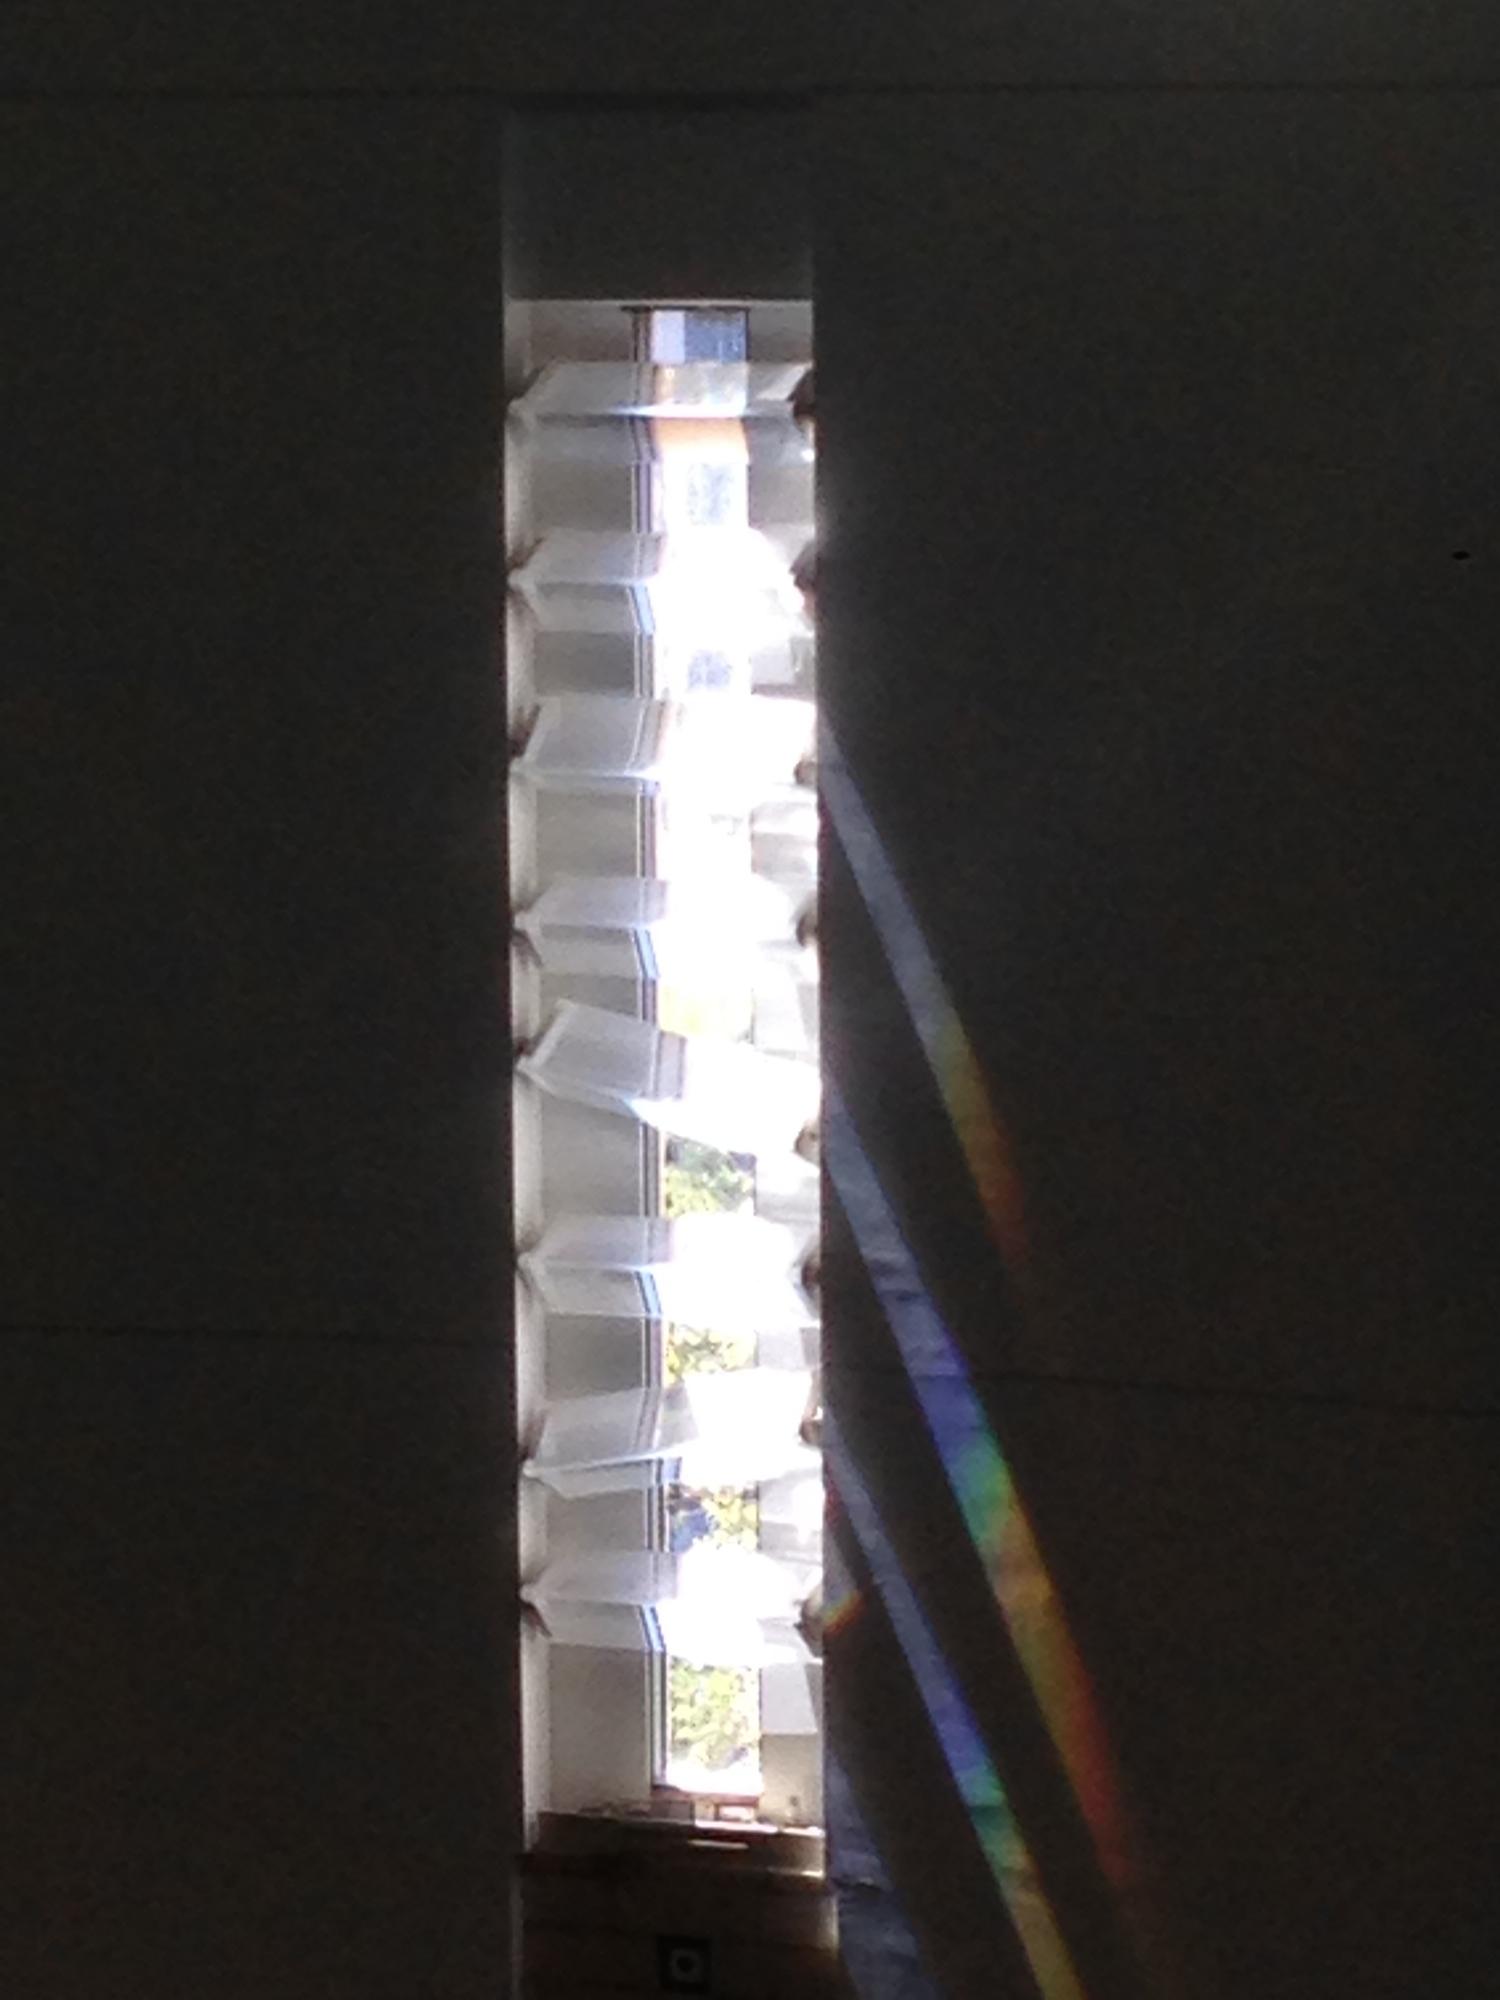 Prisms Create Rainbows in the Interior